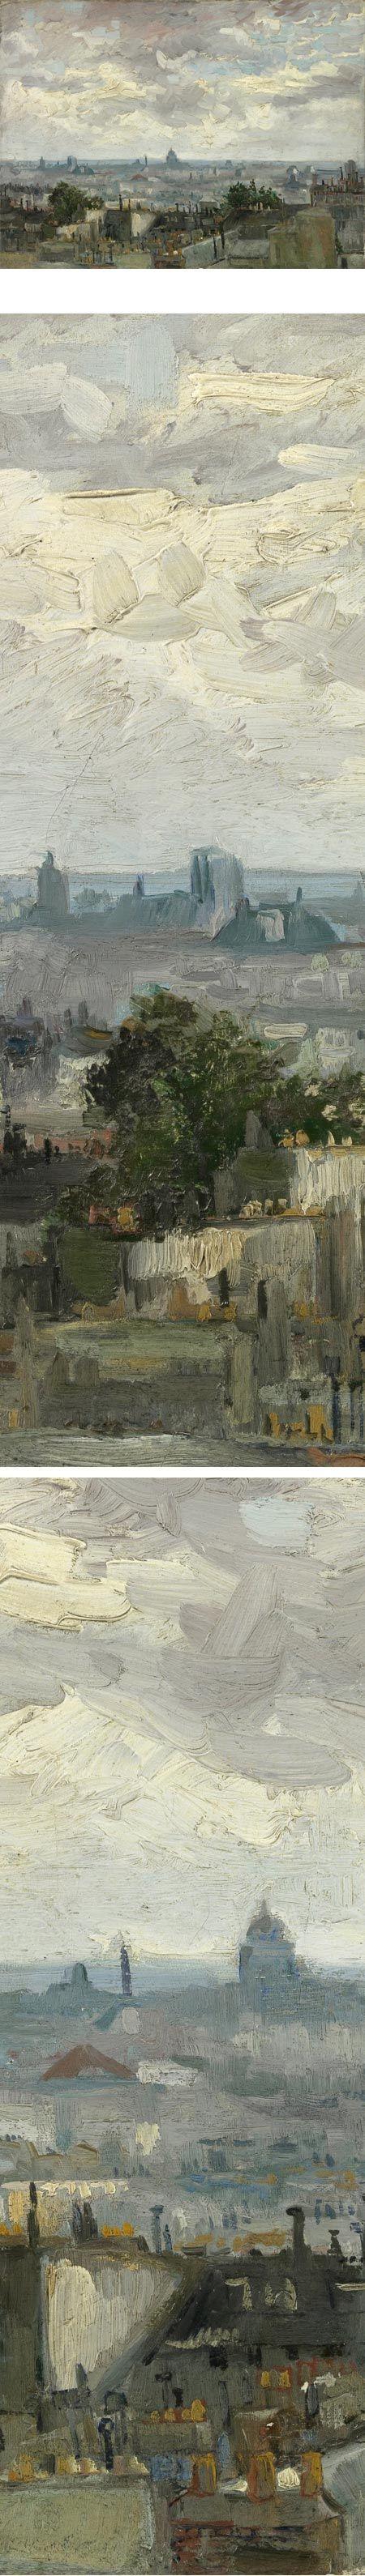 View of Paris, Vincent van Gogh. This is a wonderful Van Gogh work that is new to me. Wonderful handling of the brush.